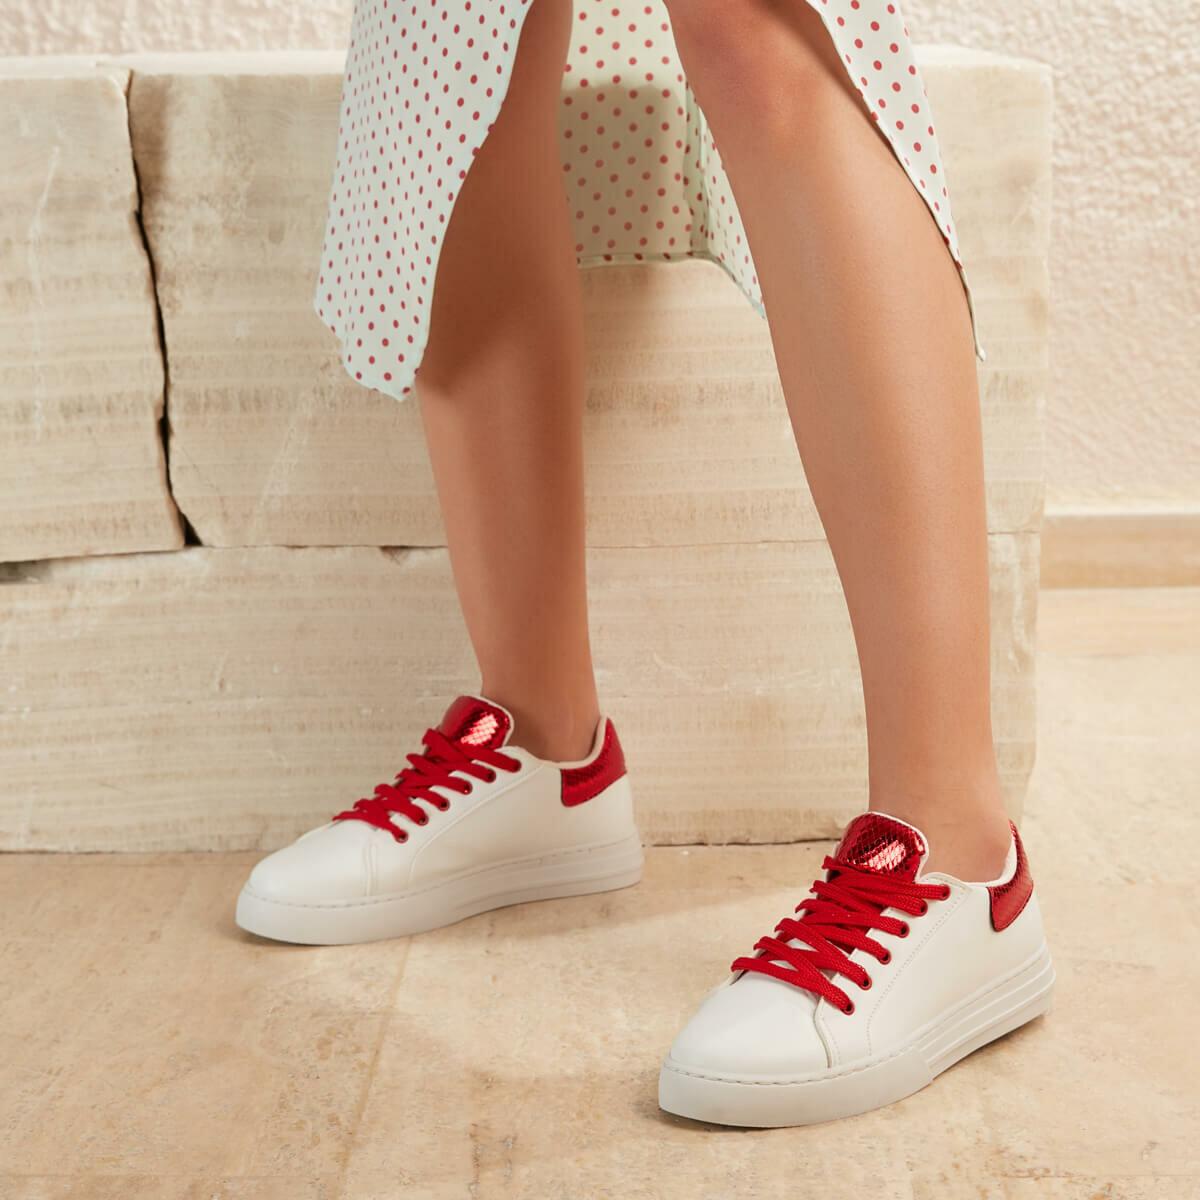 FLO GEMI01Z SKIN White Women 'S Sneaker Shoes BUTIGO